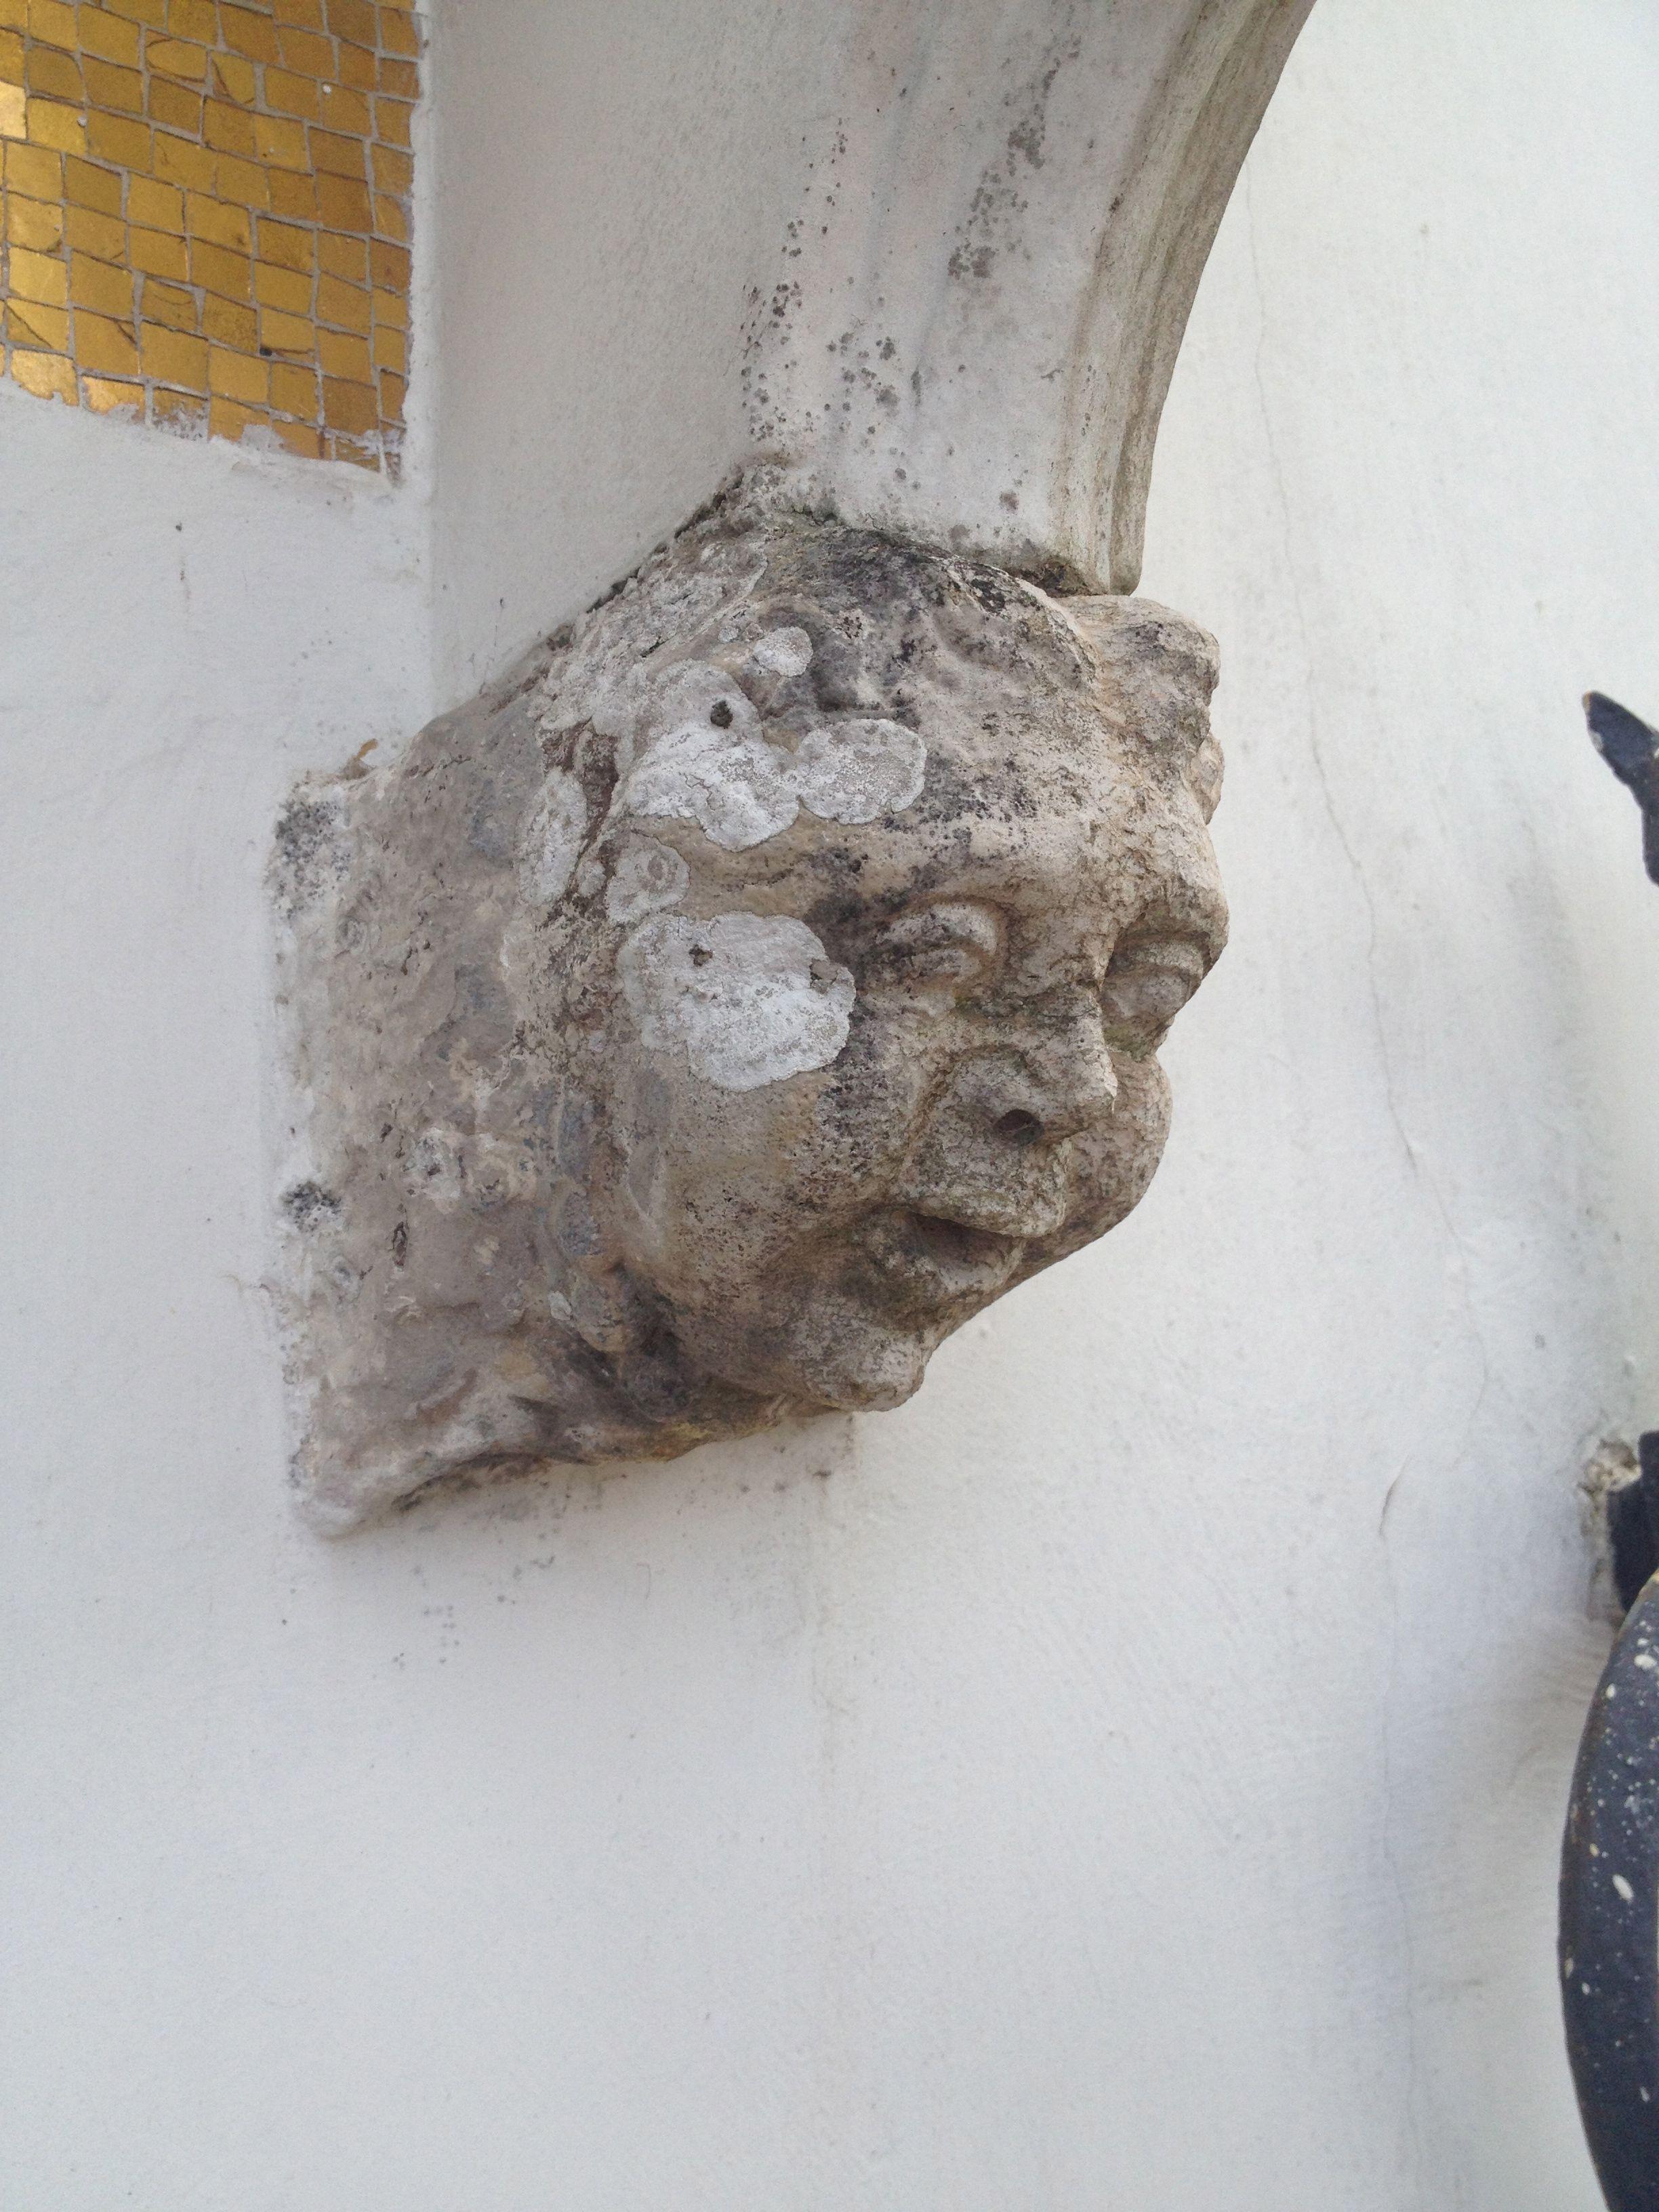 Axel Munthe – Villa San Michele Anacapri